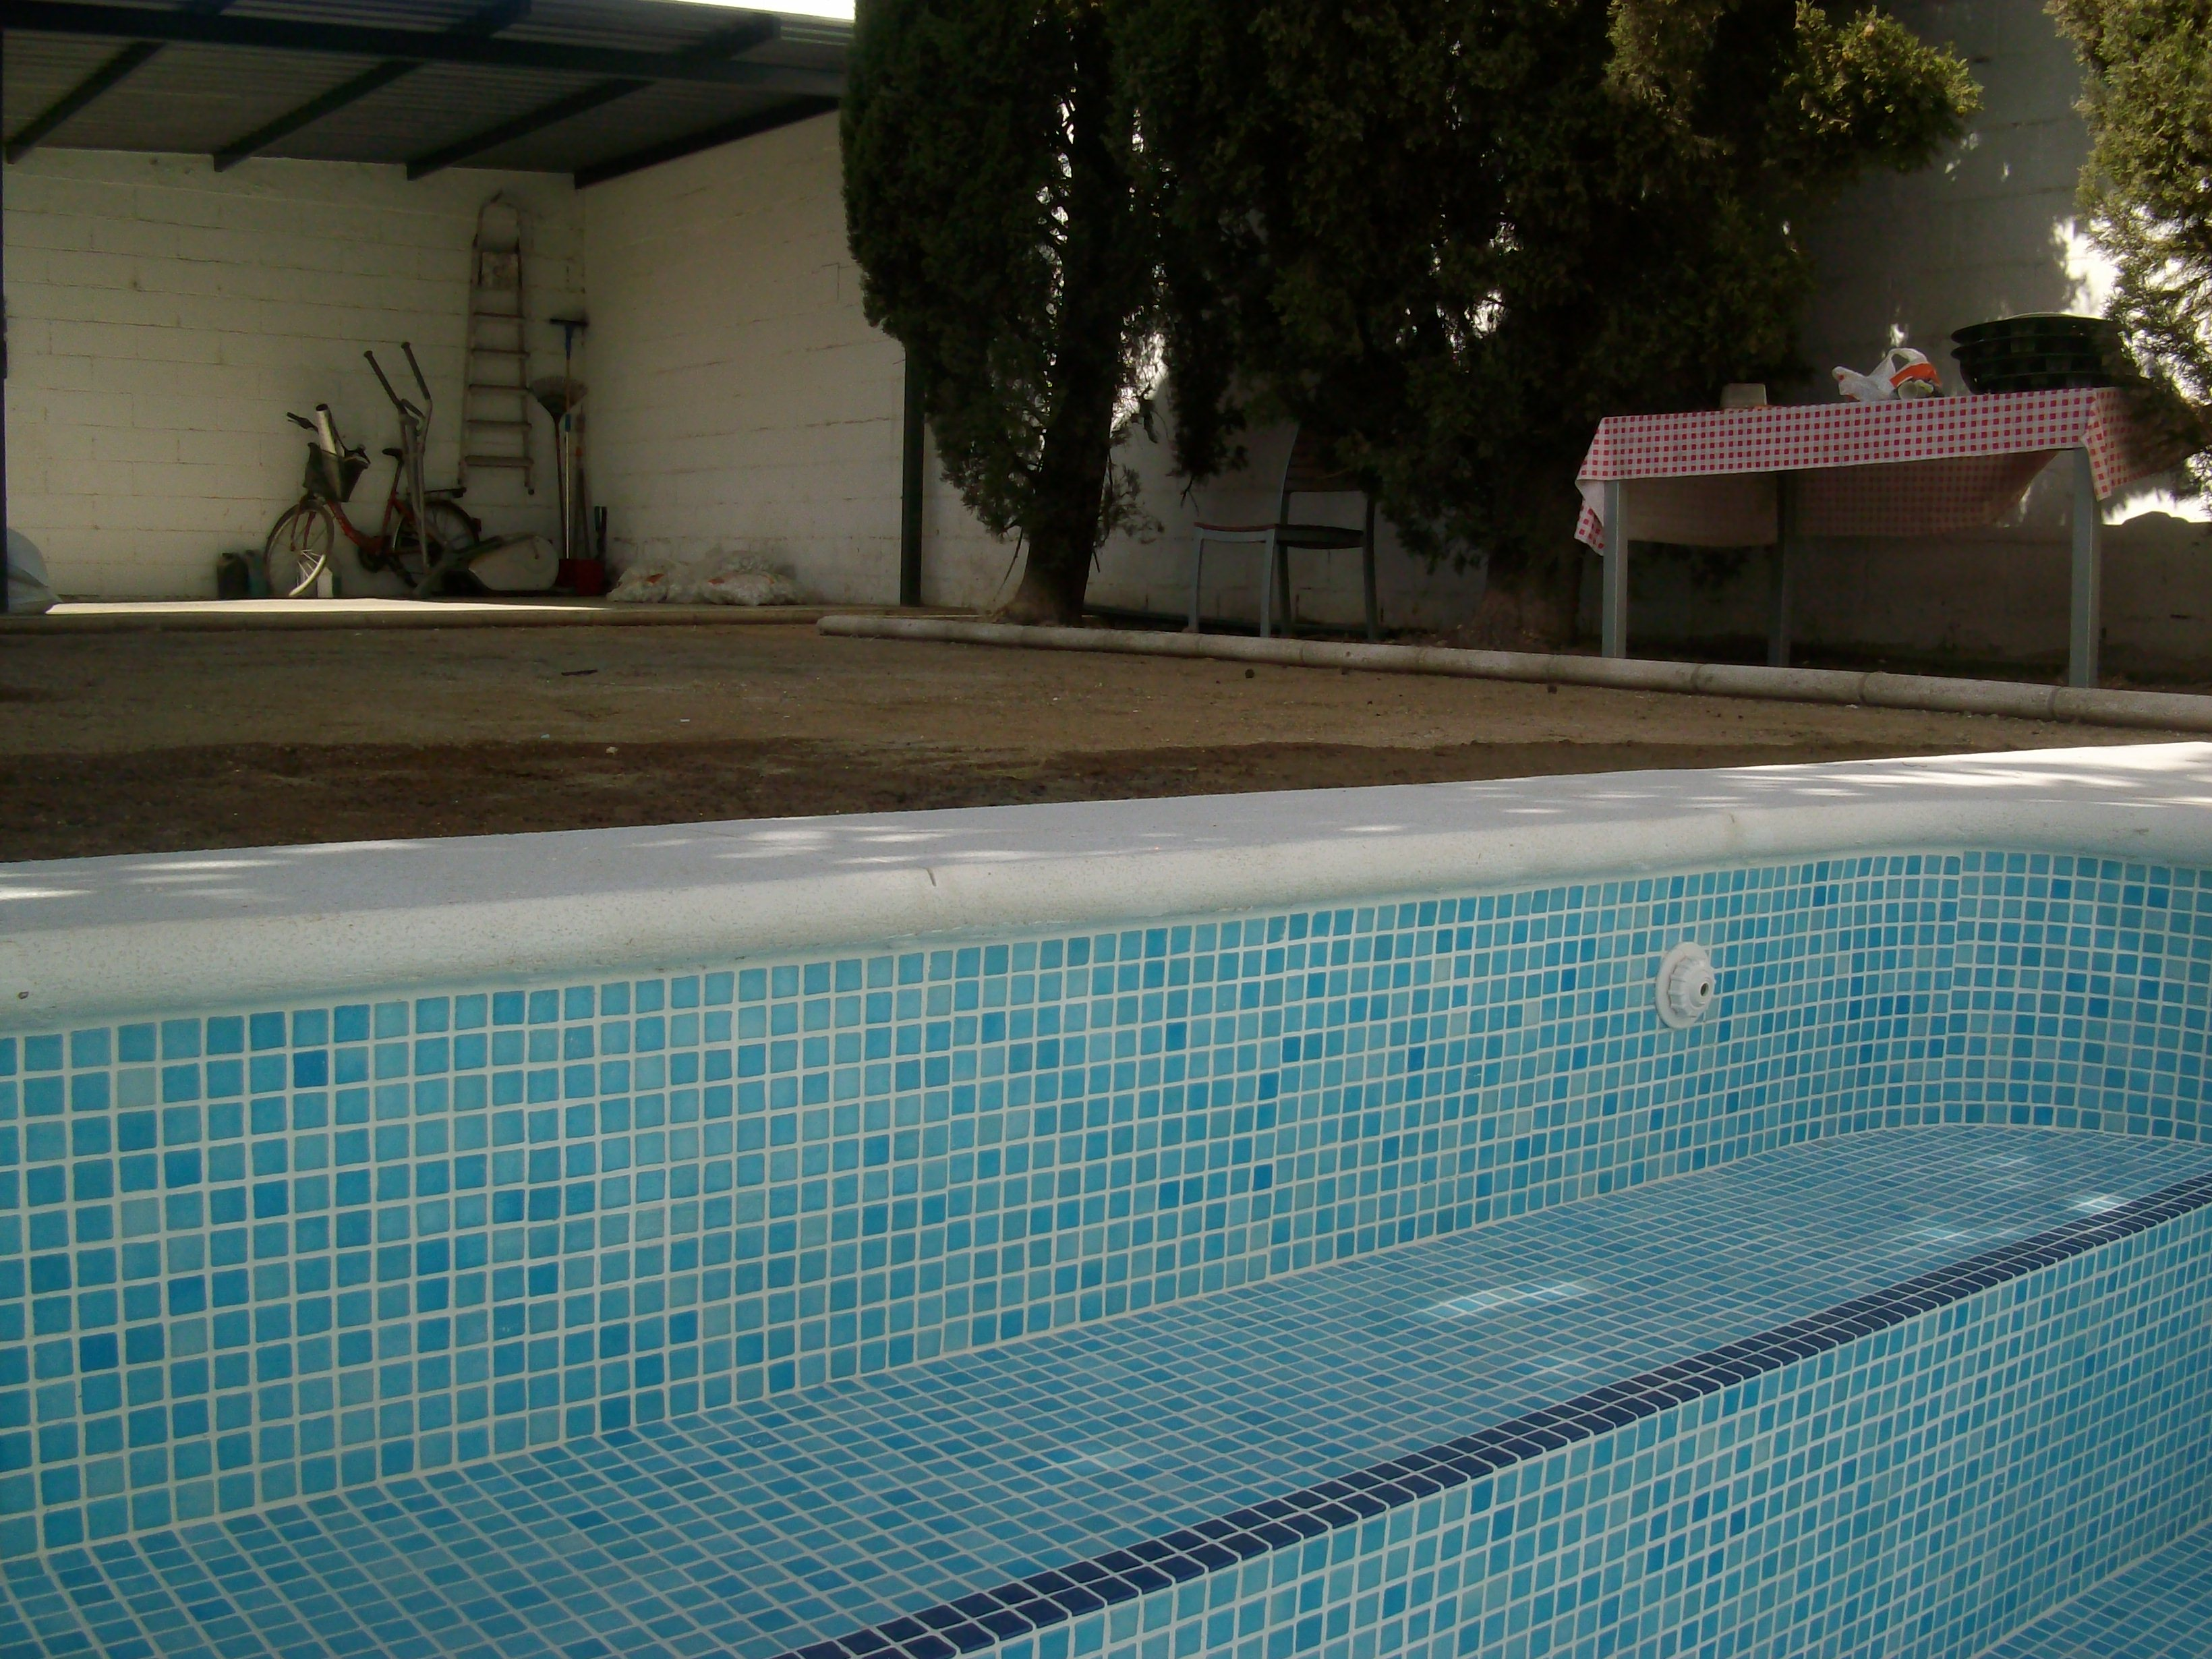 Benq digital camera construcci n de piscinas - Barrefondos para piscinas ...